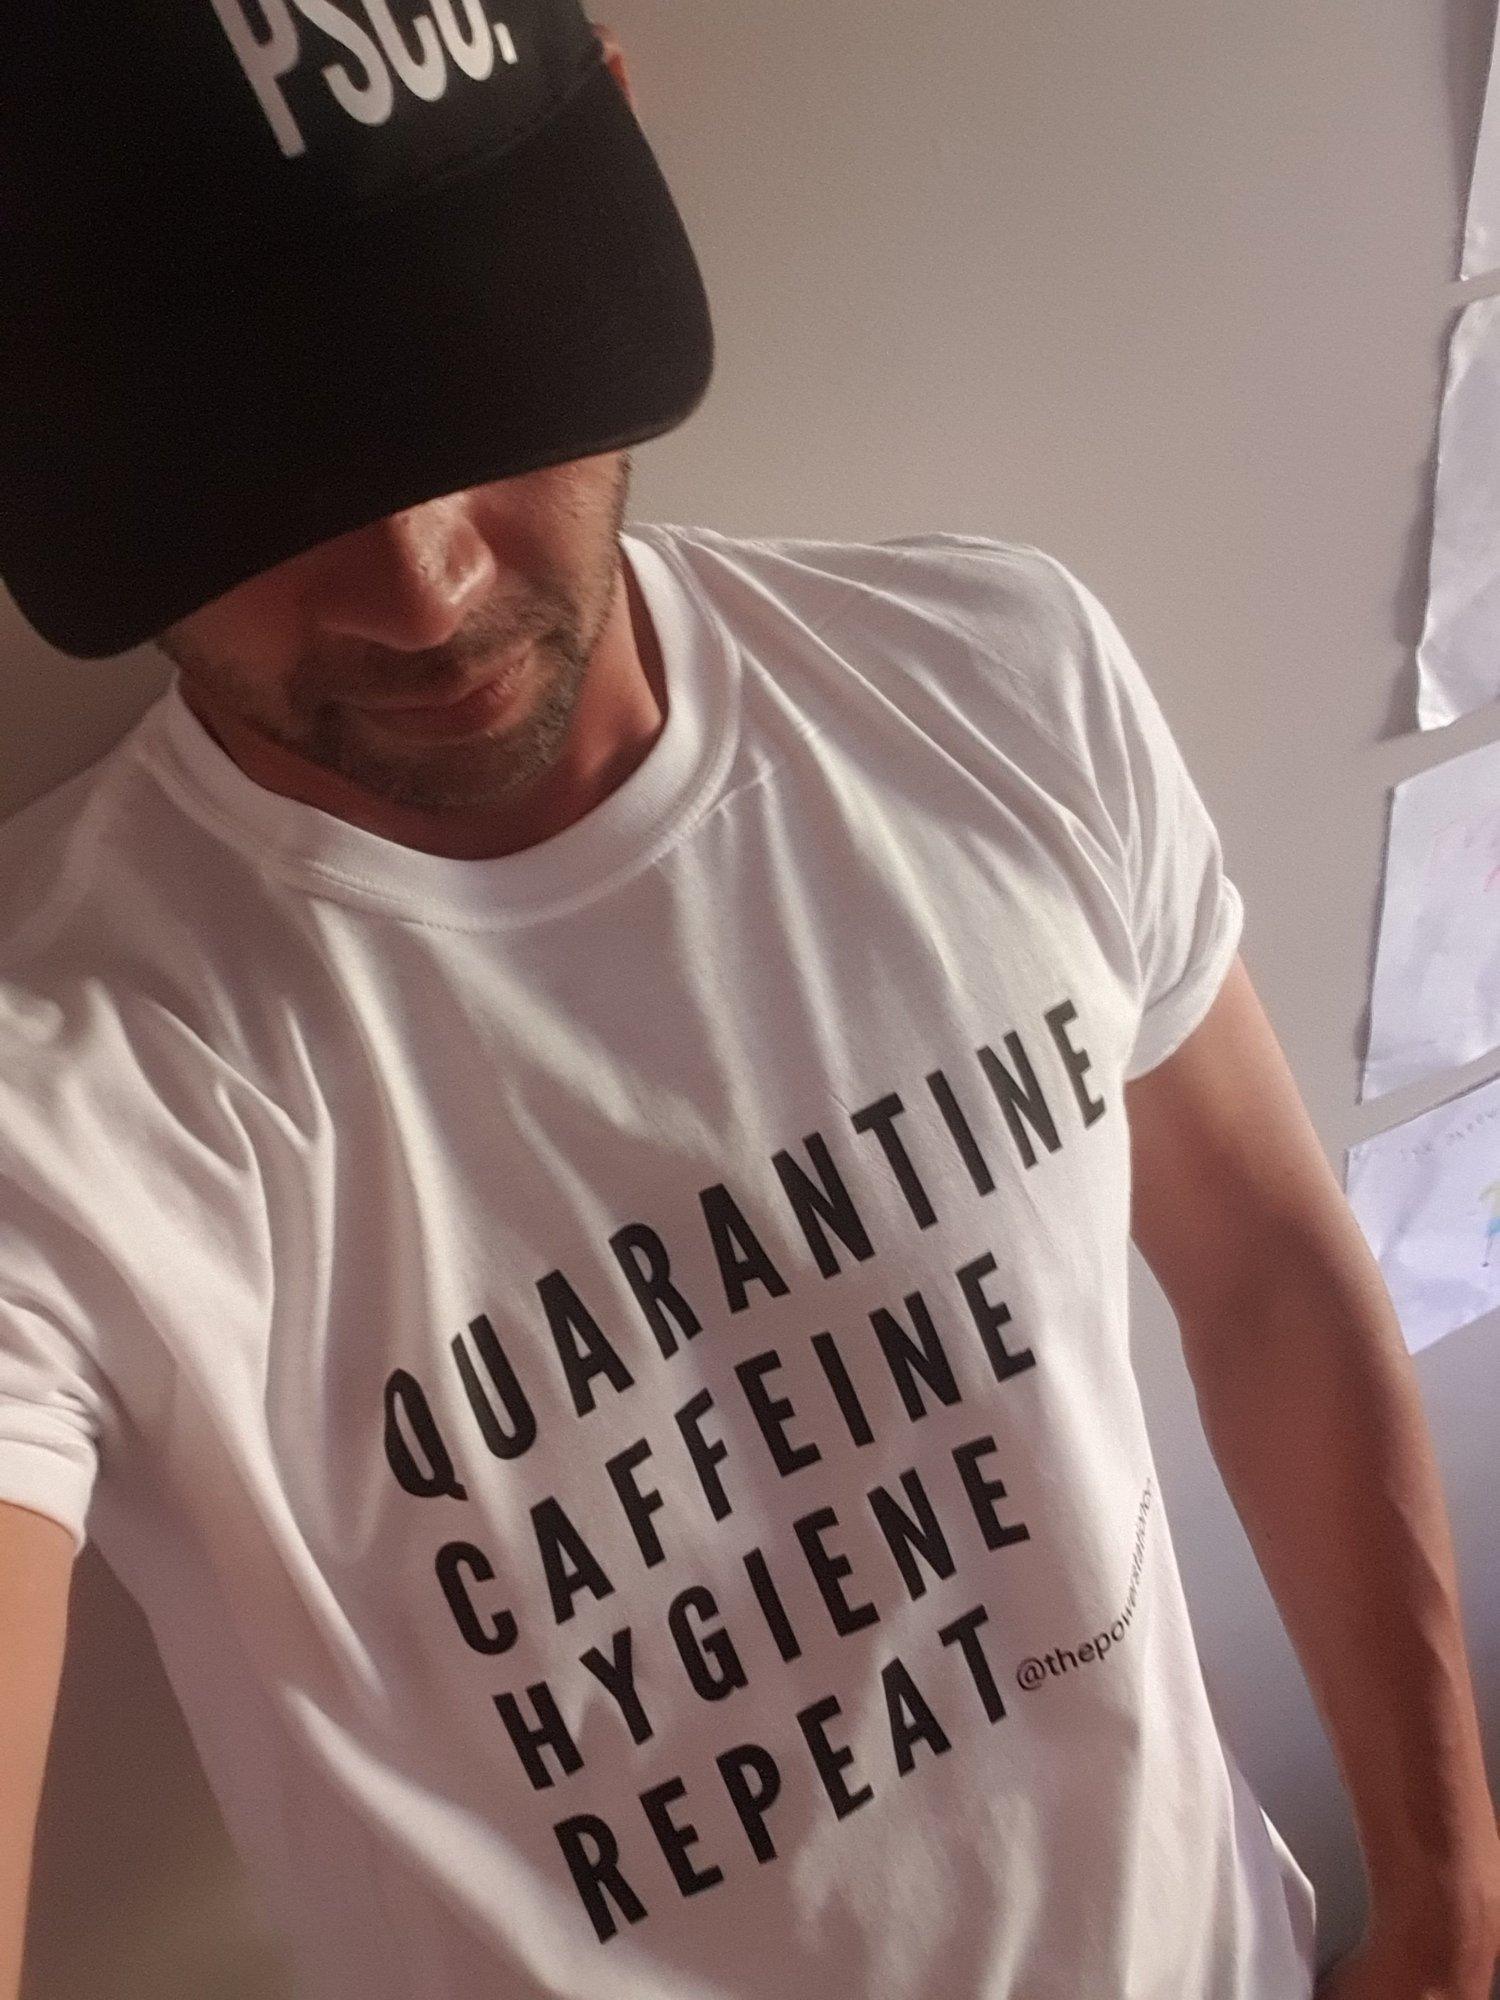 Image of Quarantine Caffeine Hygiene Repeat